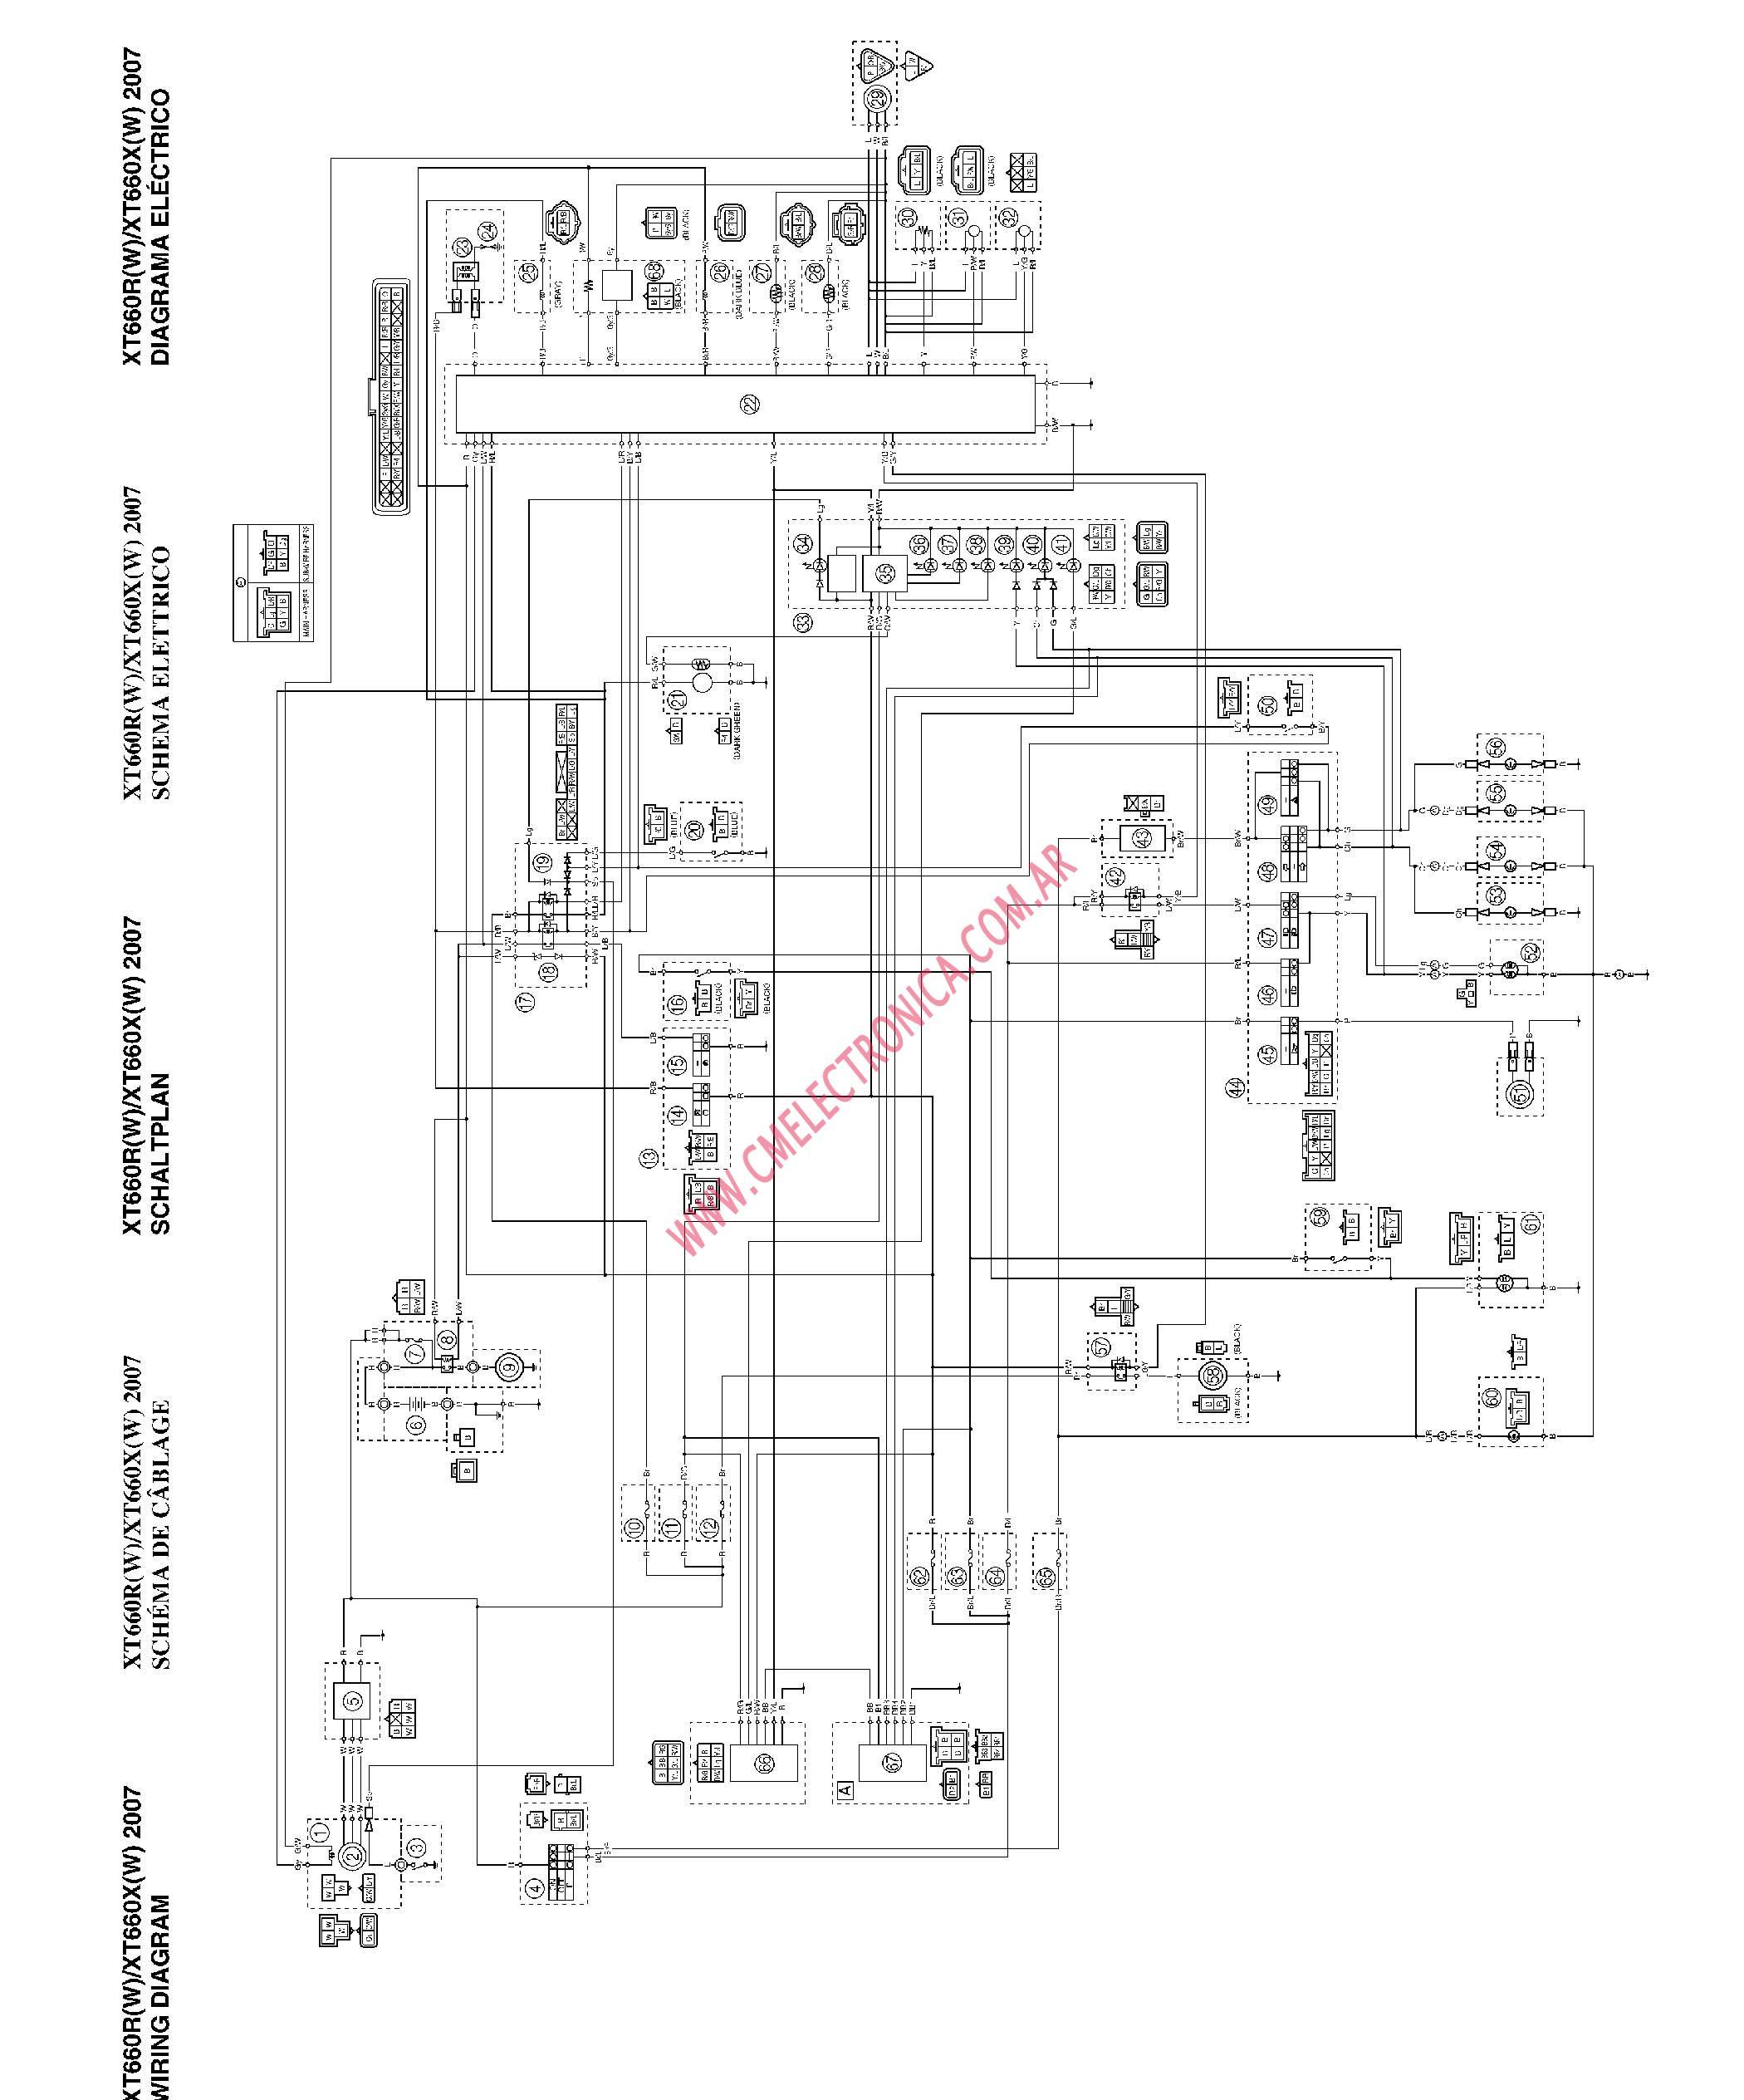 2006 Suzuki King Quad 700 Wiring Diagram Trusted Schematics 99 Yamaha Big Bear 2007 40 Images Quadrunner